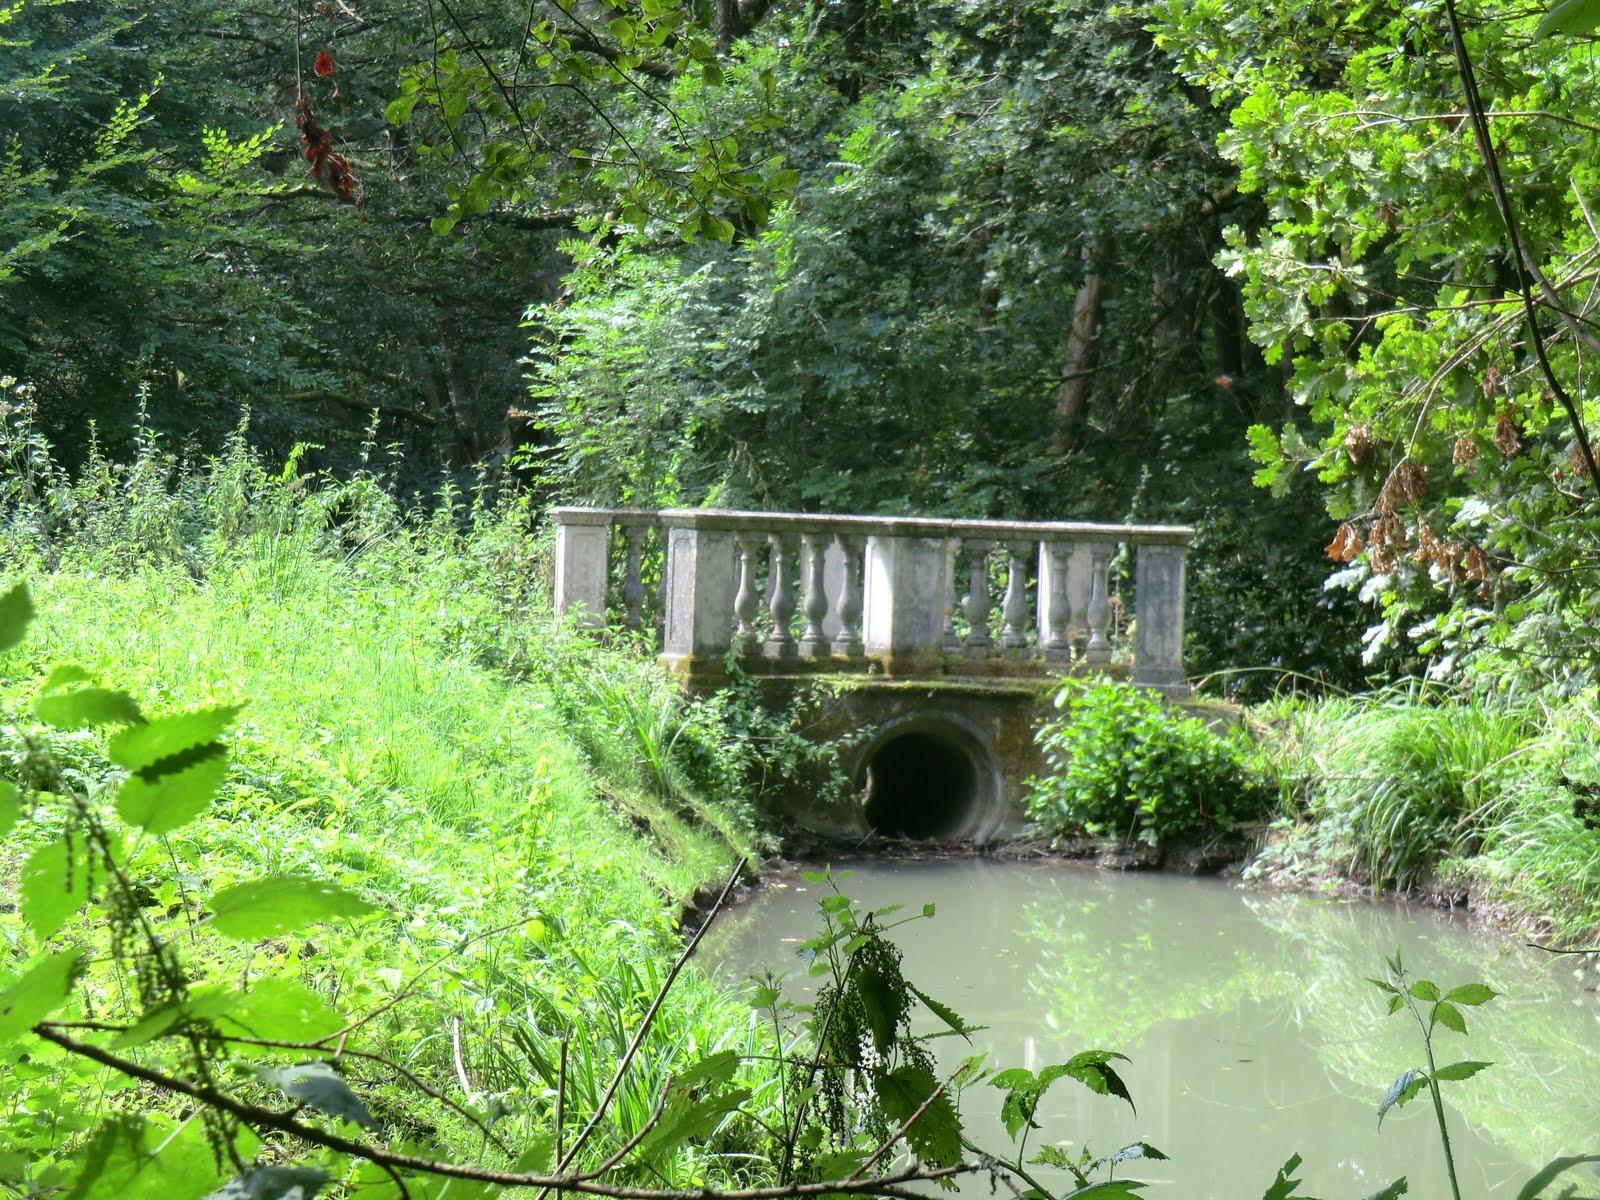 CIMG3457 Ornamental bridge, Cuckfield Park